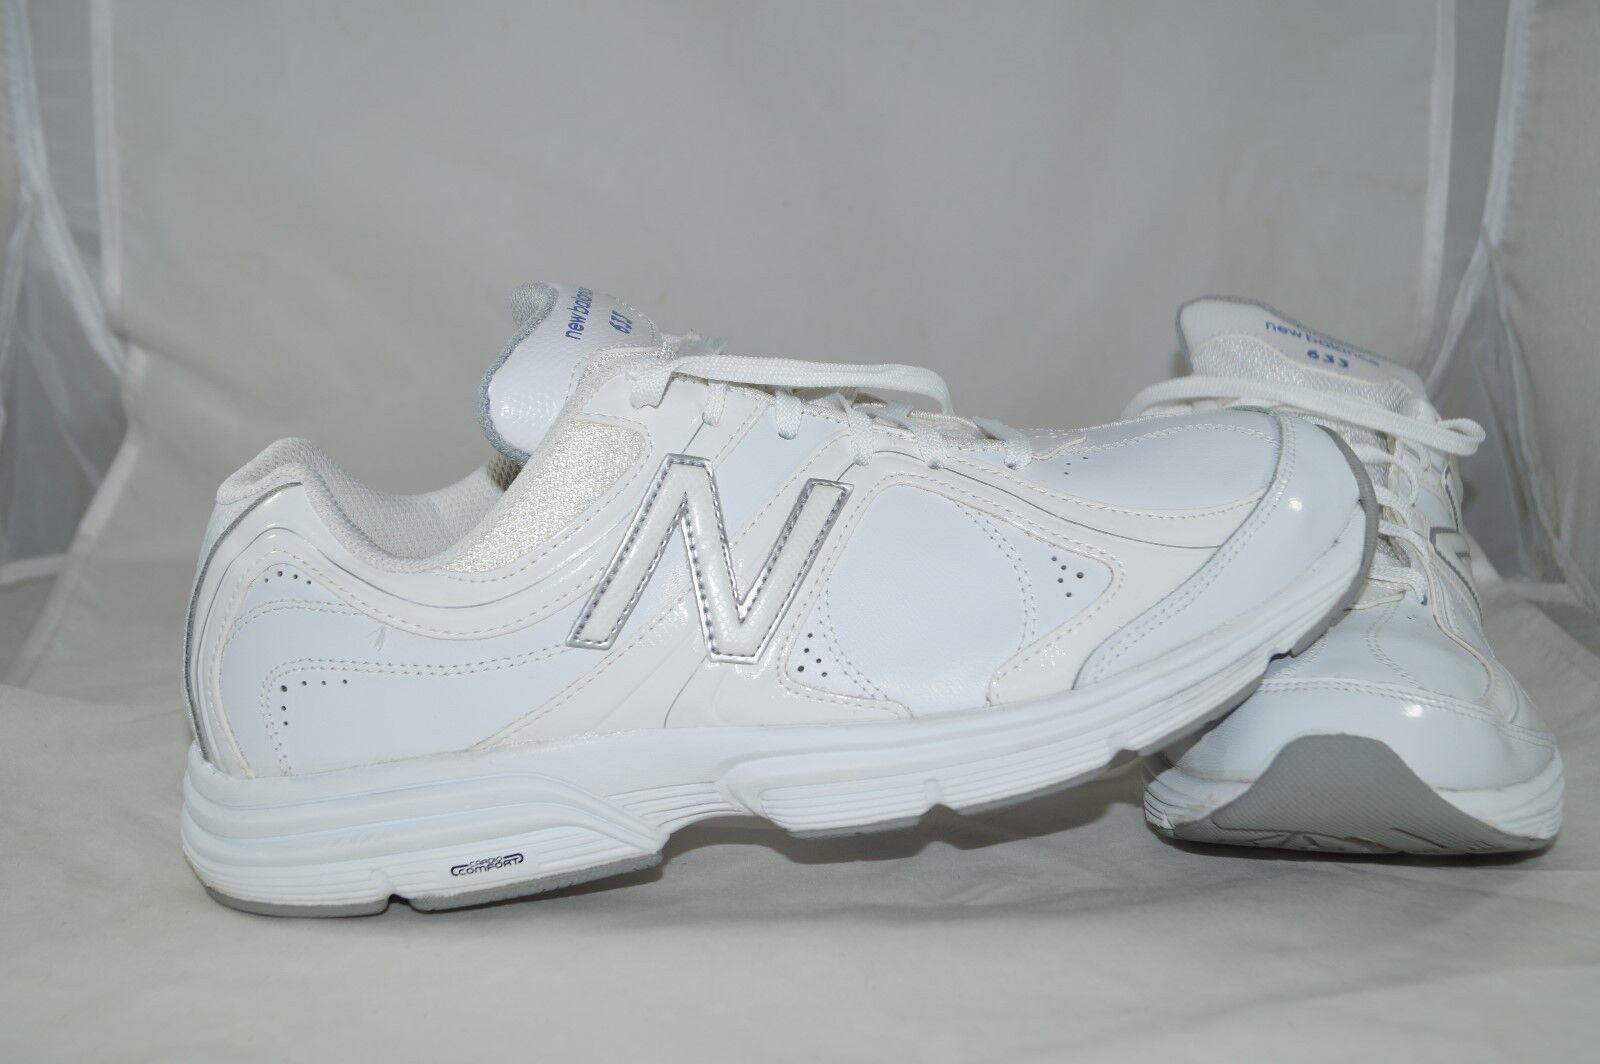 New balance 633 cardio Comfort GR  43 Zapatos Zapatos Zapatos señora Cross Trainers 201a4d